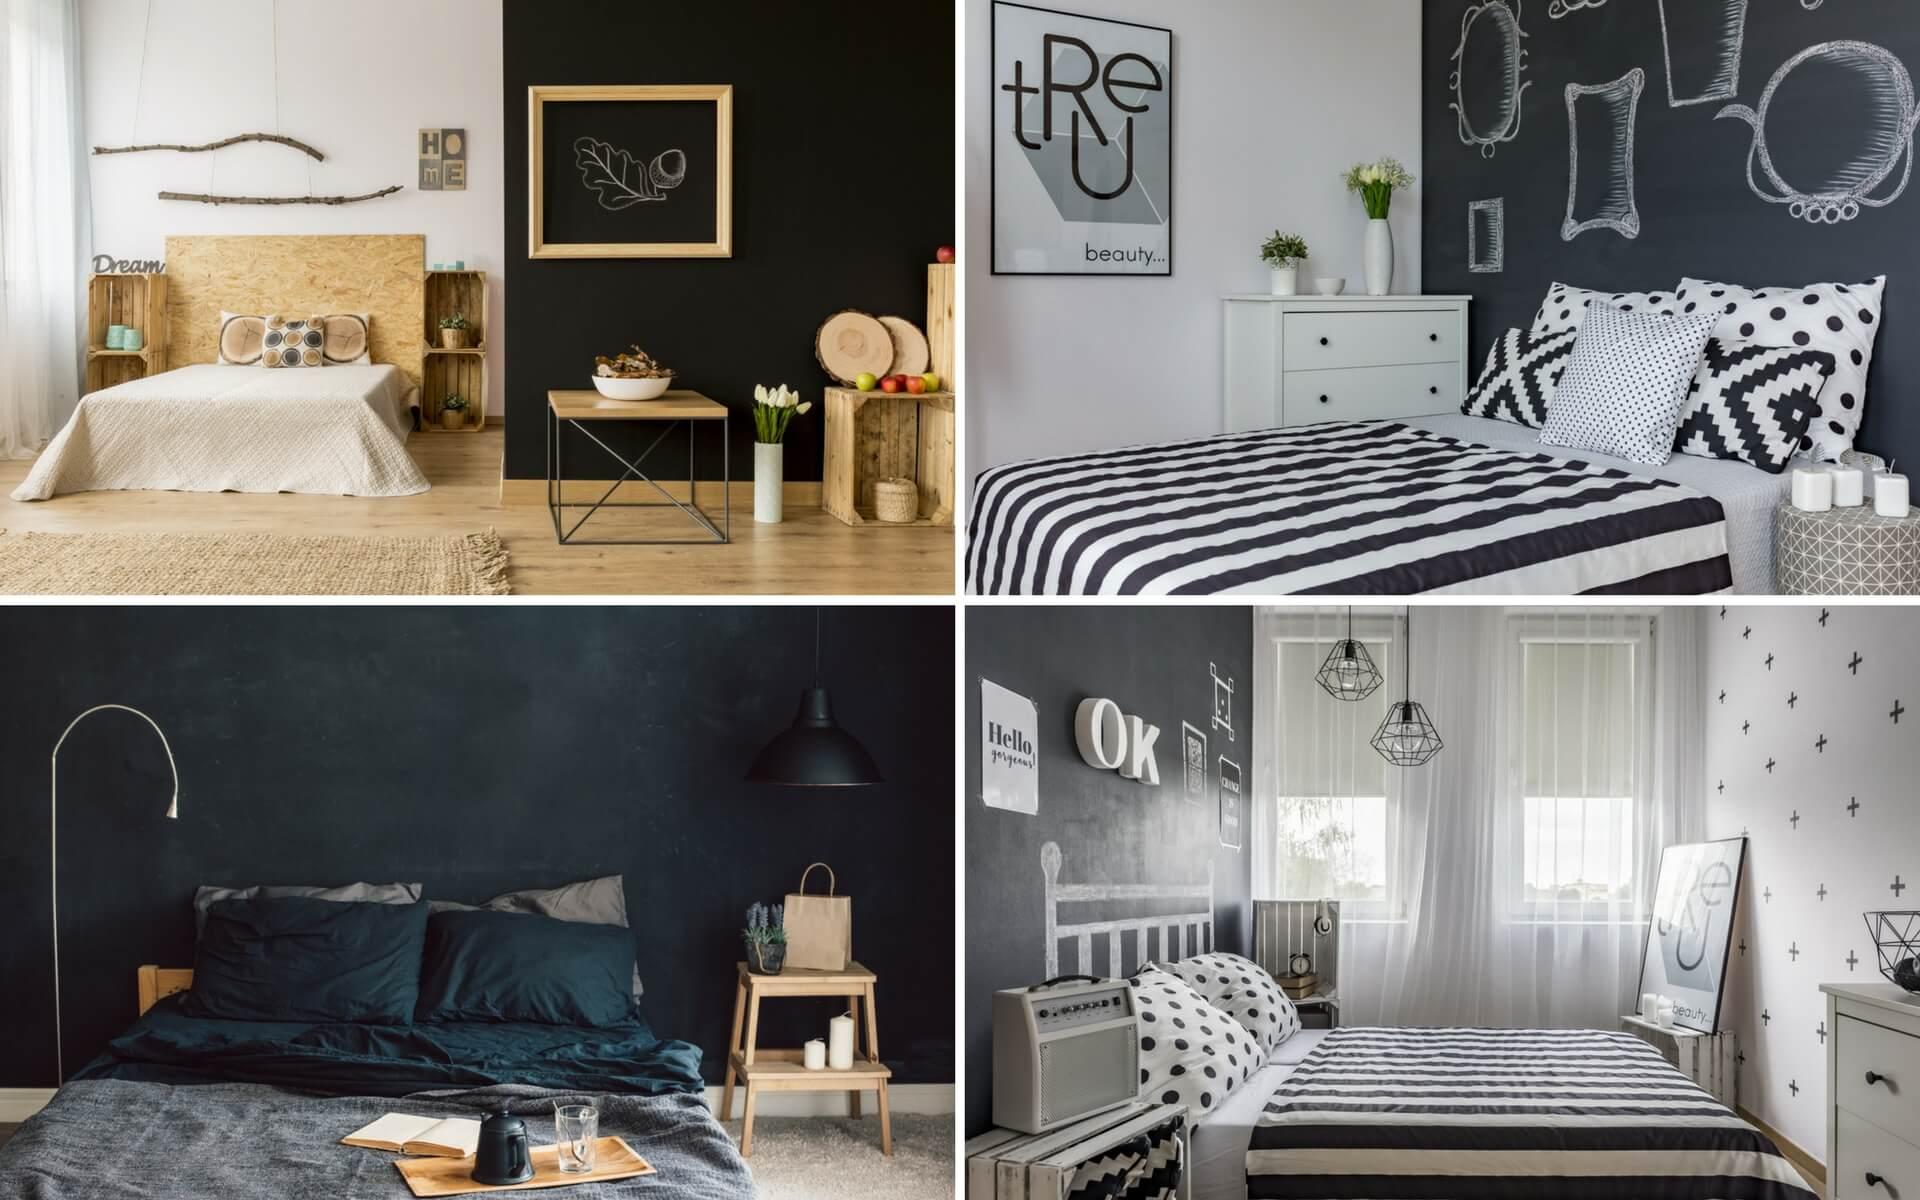 Pareti Di Lavagna : Decorare le pareti con vernice lavagna oknoplast